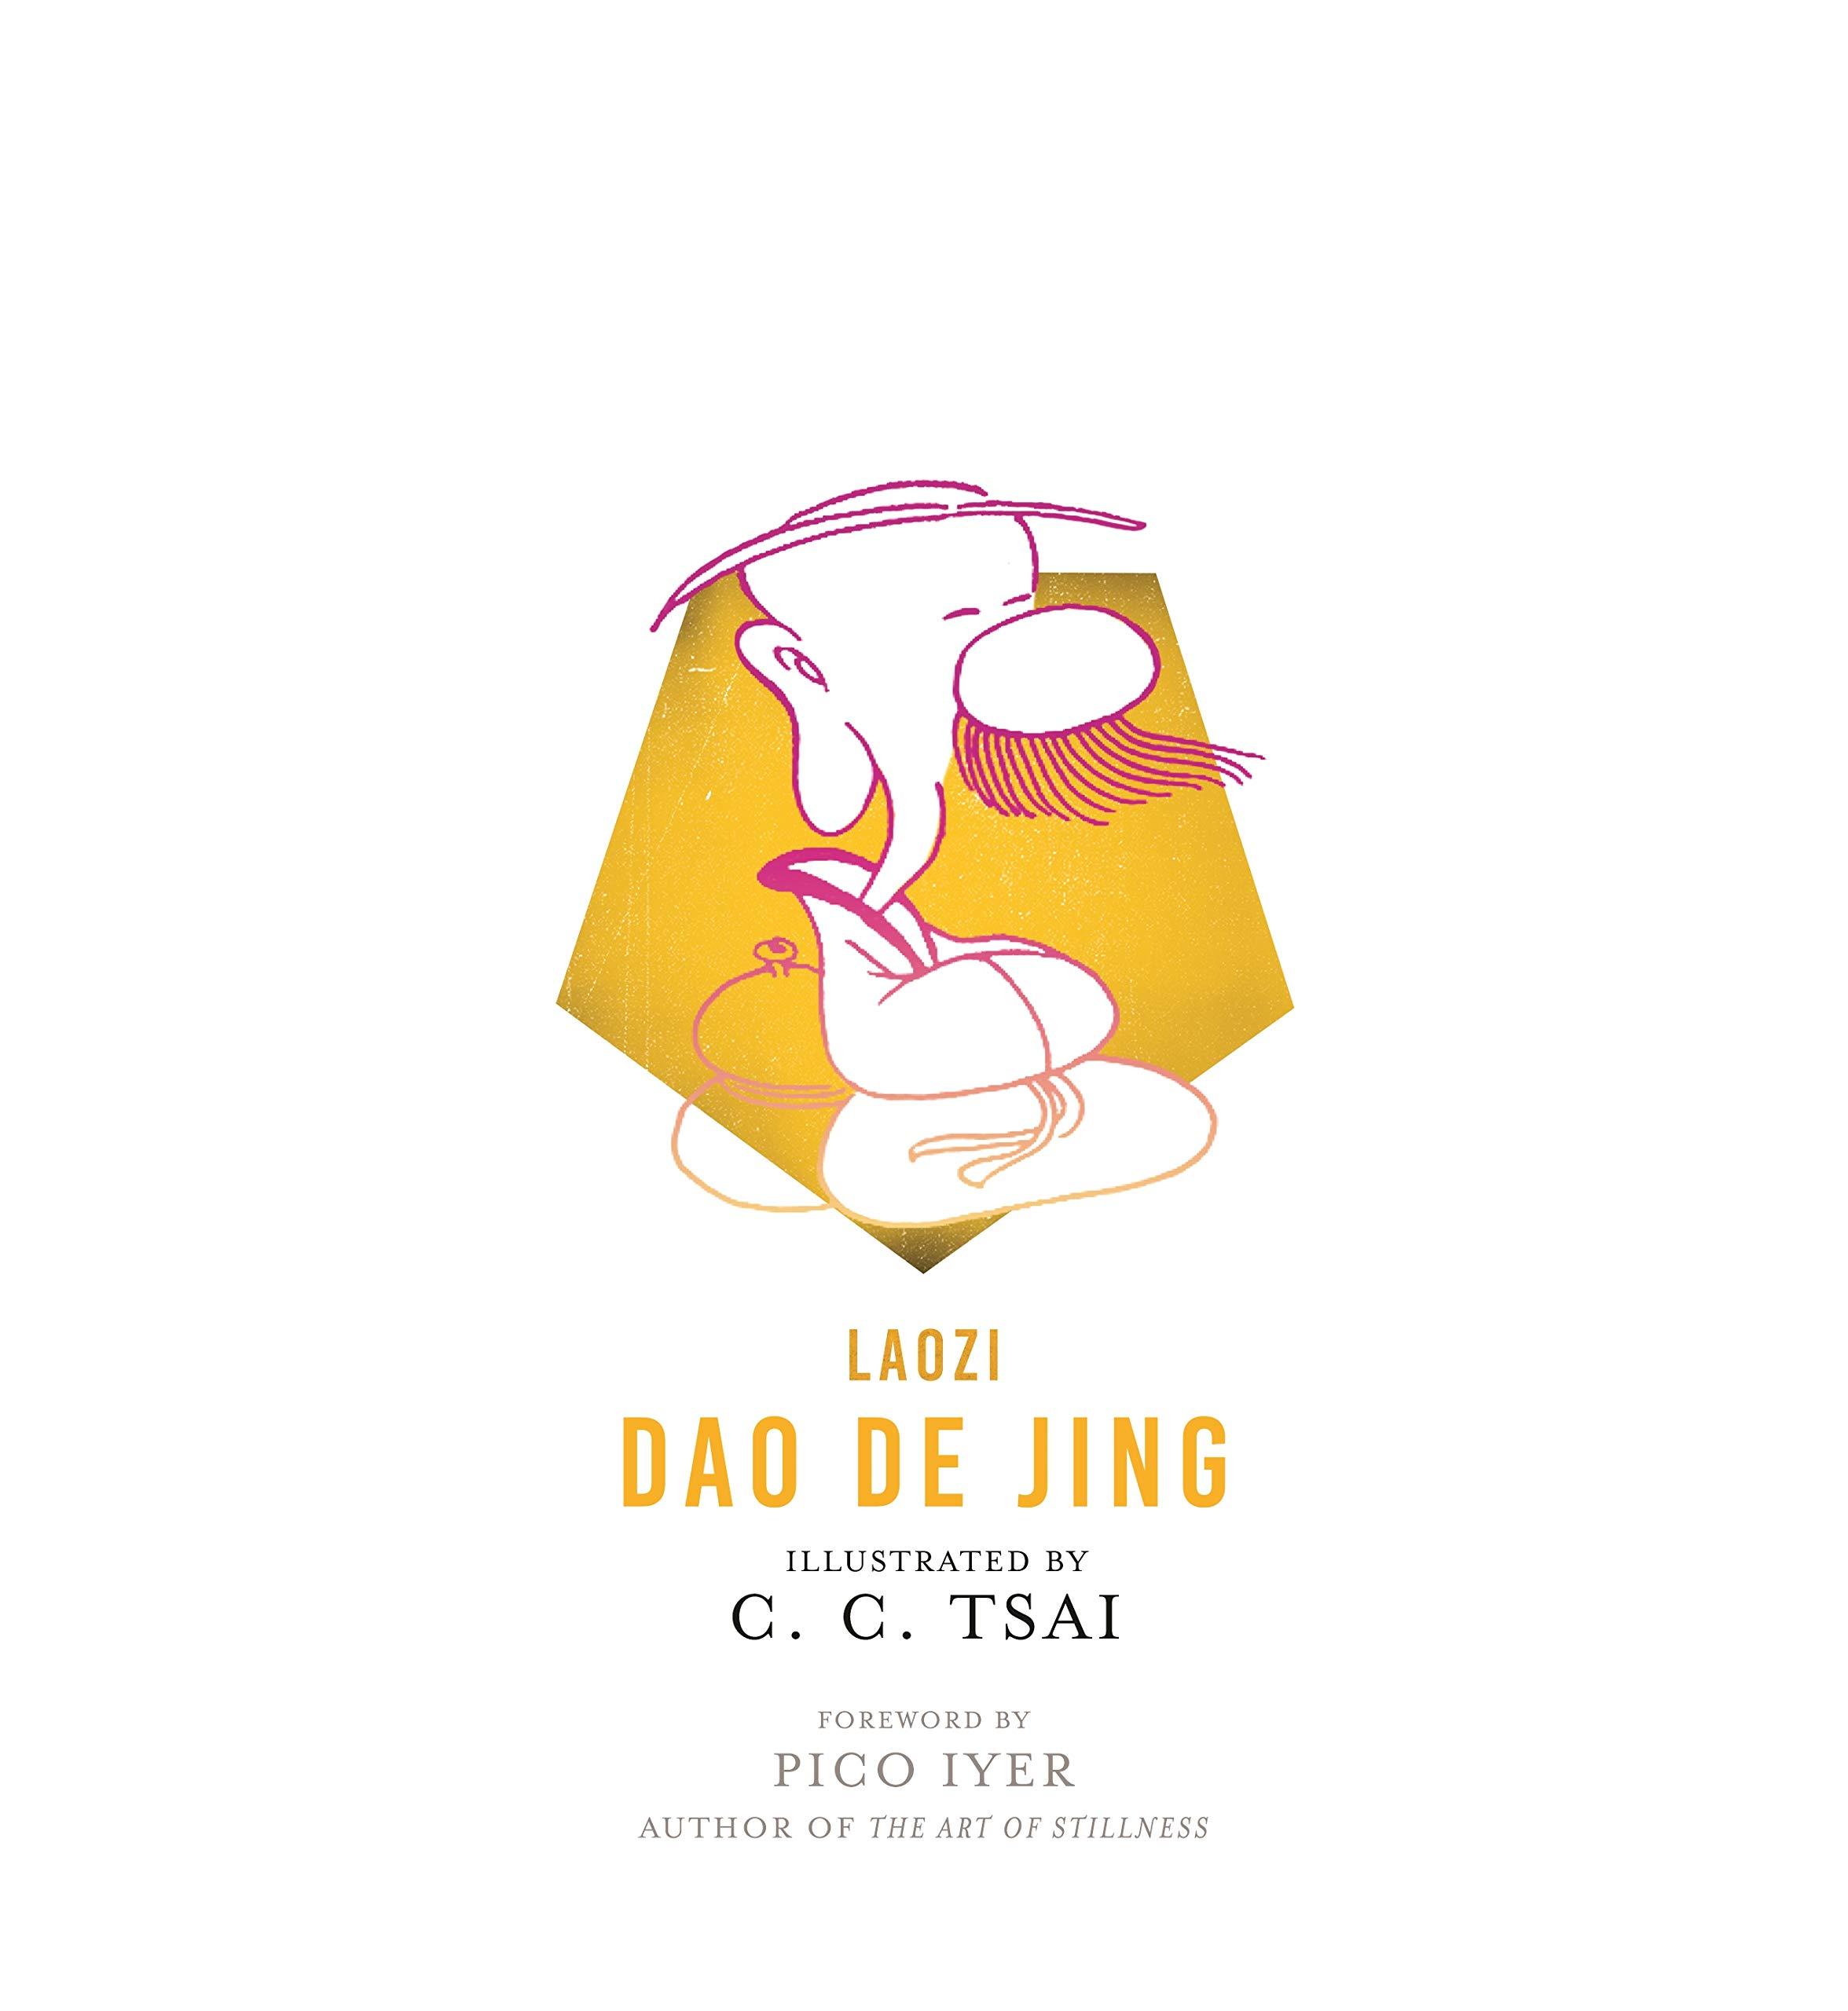 Dao De Jing (The Illustrated Library of Chinese Classics): Laozi, Tsai, C.  C., Bruya, Brian, Iyer, Pico: 9780691179773: Amazon.com: Books